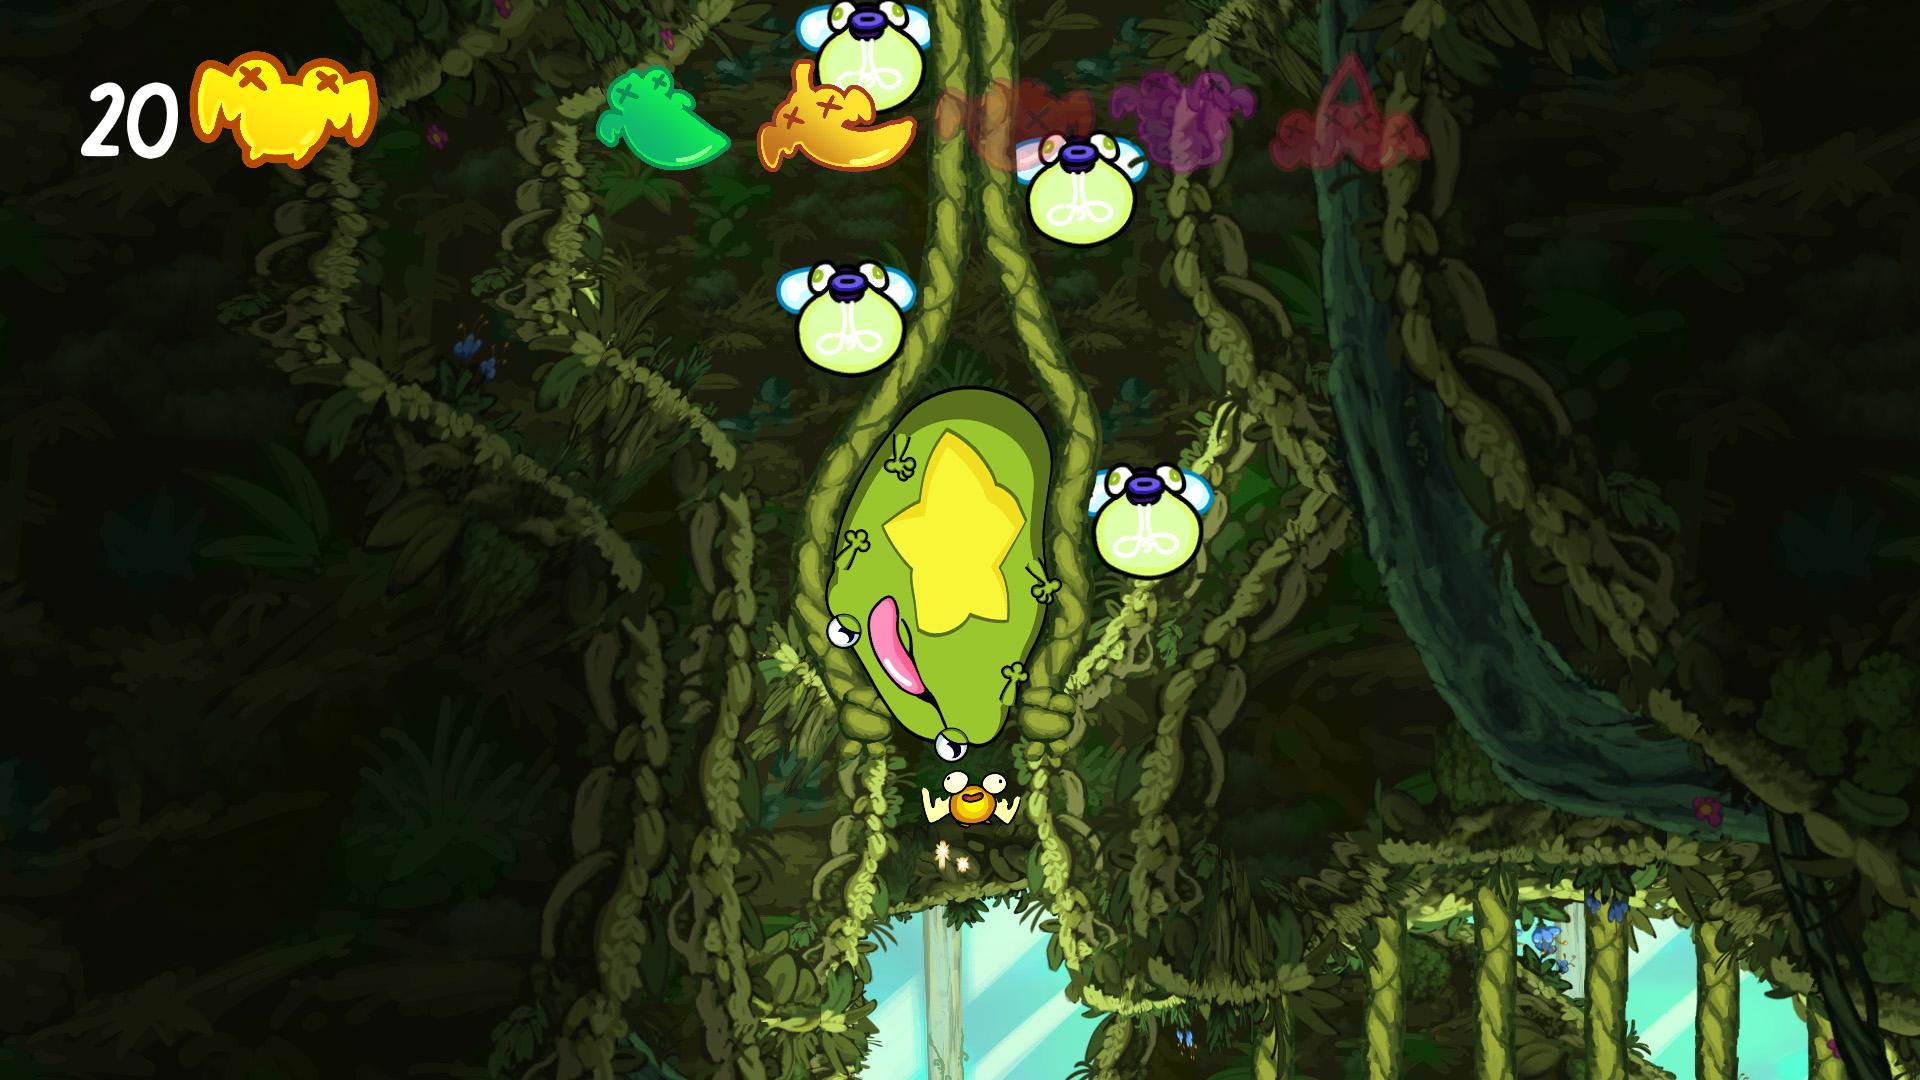 Pump the Frog screen_1920x1080_2018-11-22_11-15-49.jpg